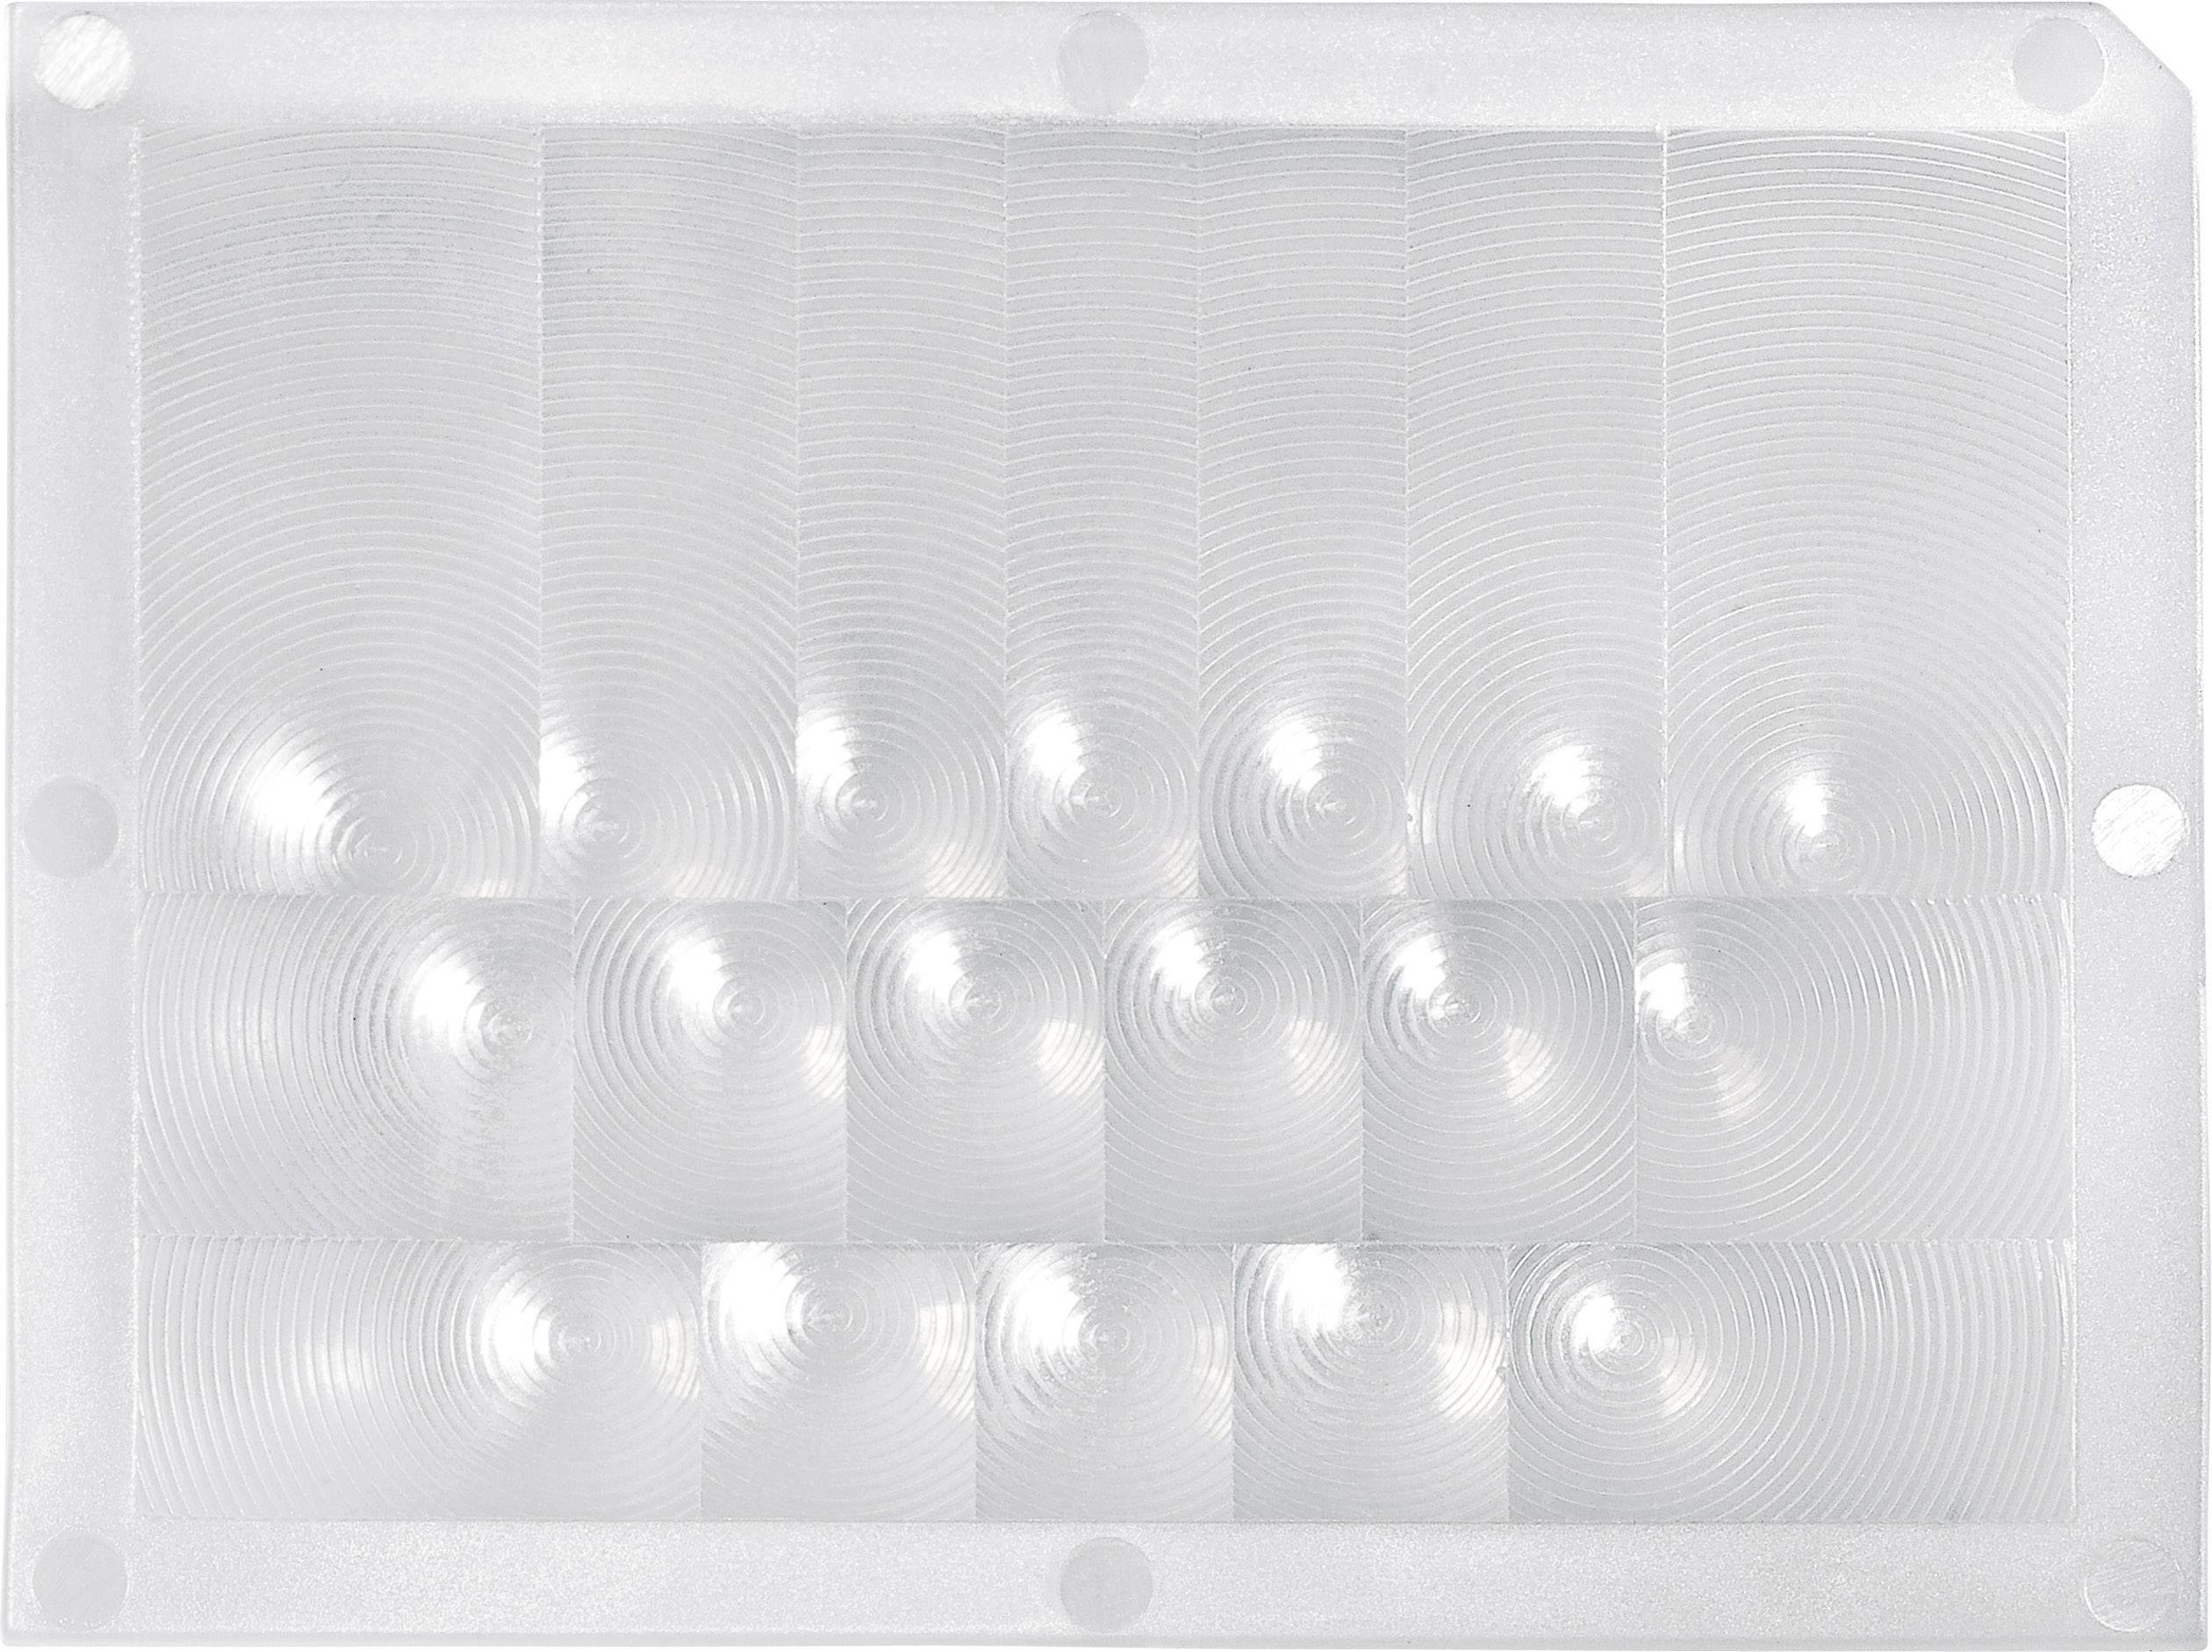 Čočka pro PIR senzor Murata IML-0666, (d x š) 33,9 mm x 26 mm, přírodní bílá